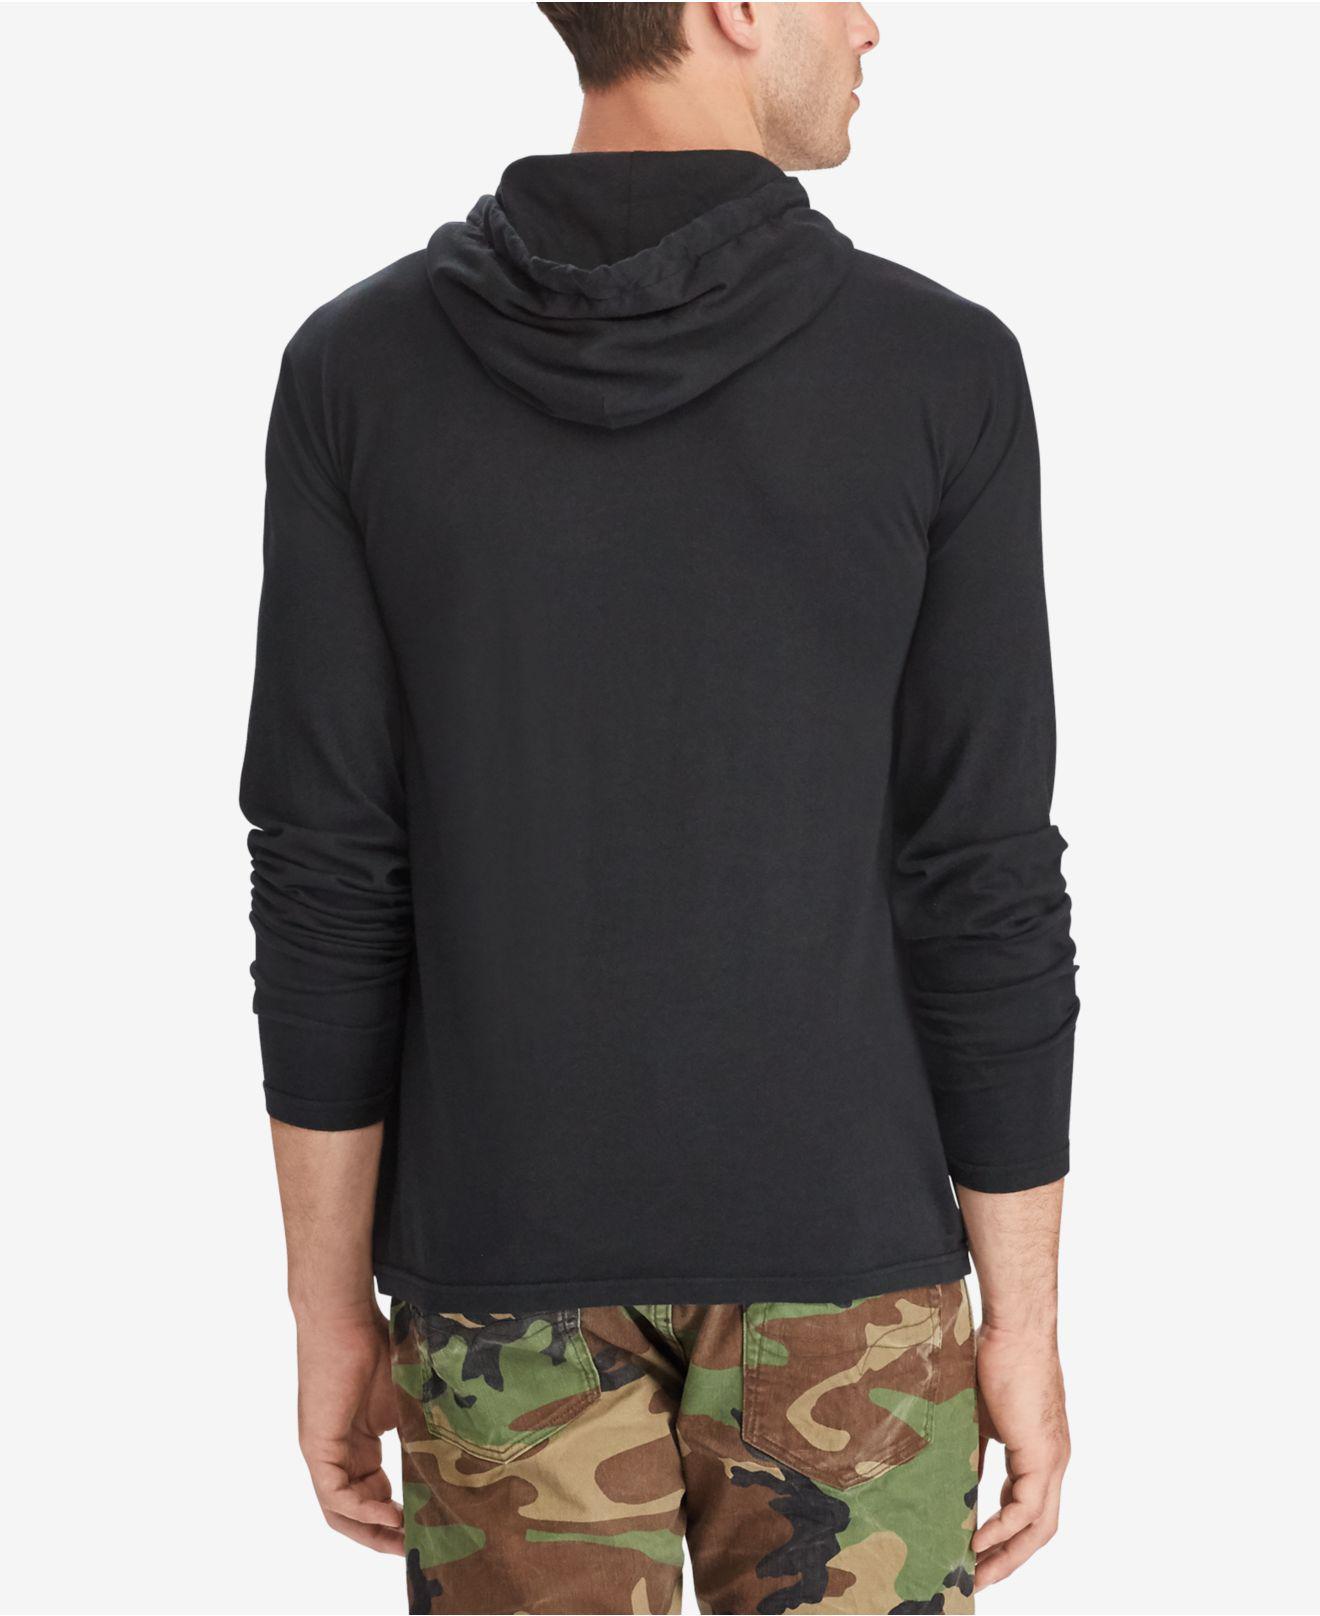 071651261496 Lyst - Polo Ralph Lauren Men s Jersey T-shirt Hoodie in Black for Men -  Save 17%